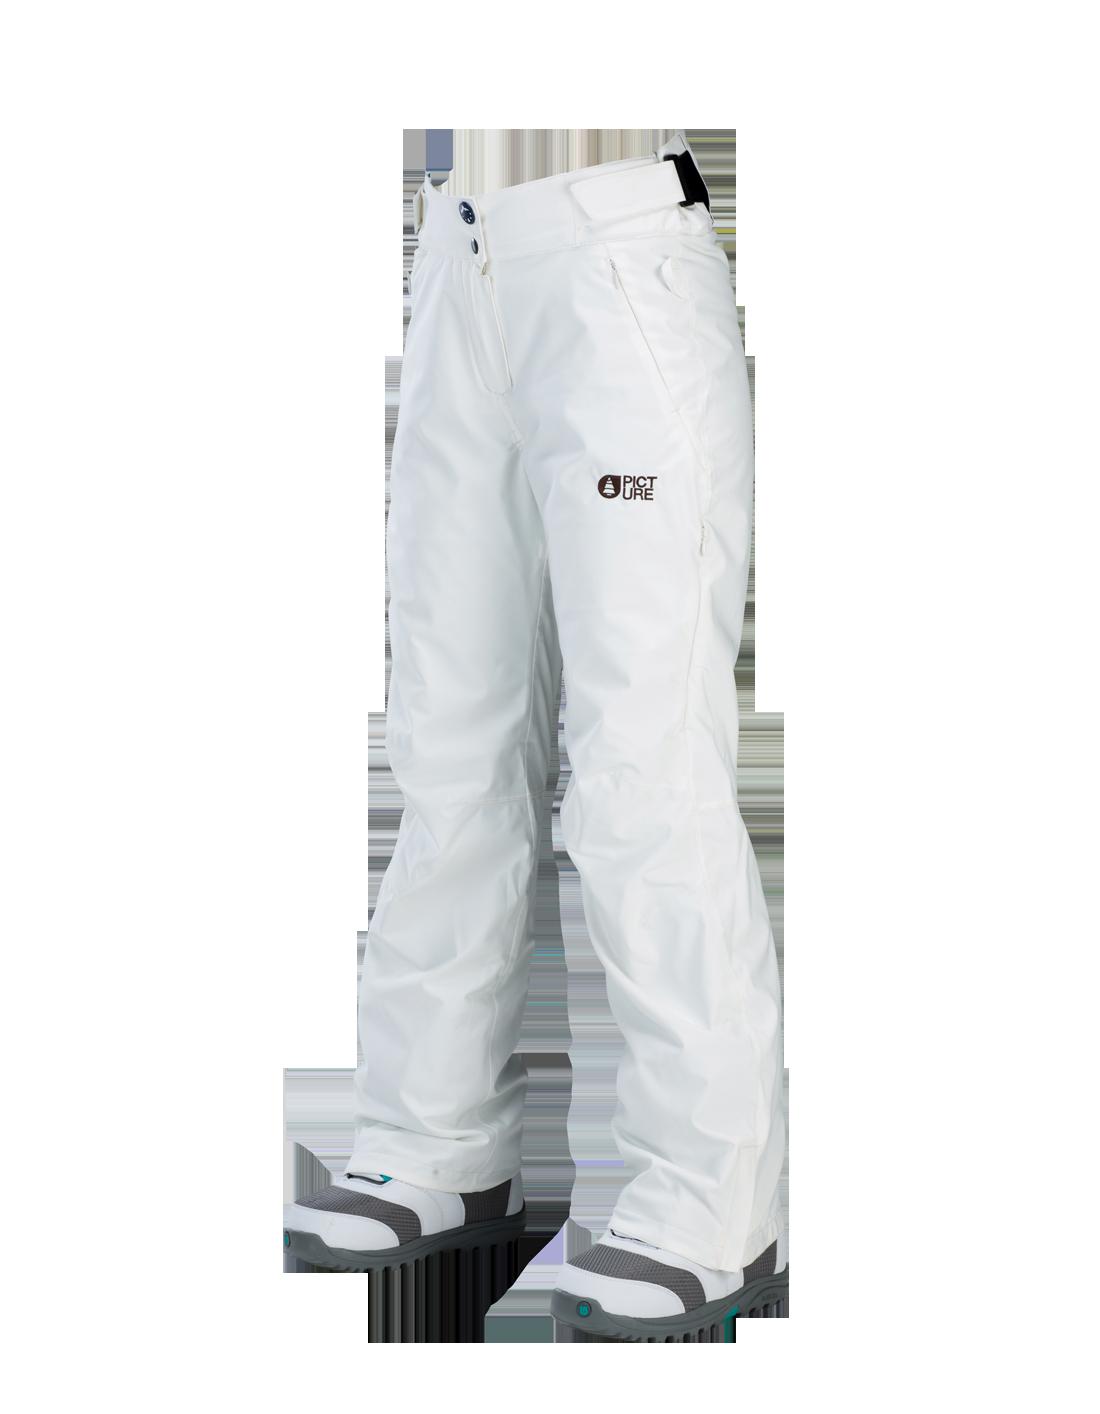 Купить Брюки сноубордические Picture Organic 2015-16 FLY pant White Одежда сноубордическая 1219664